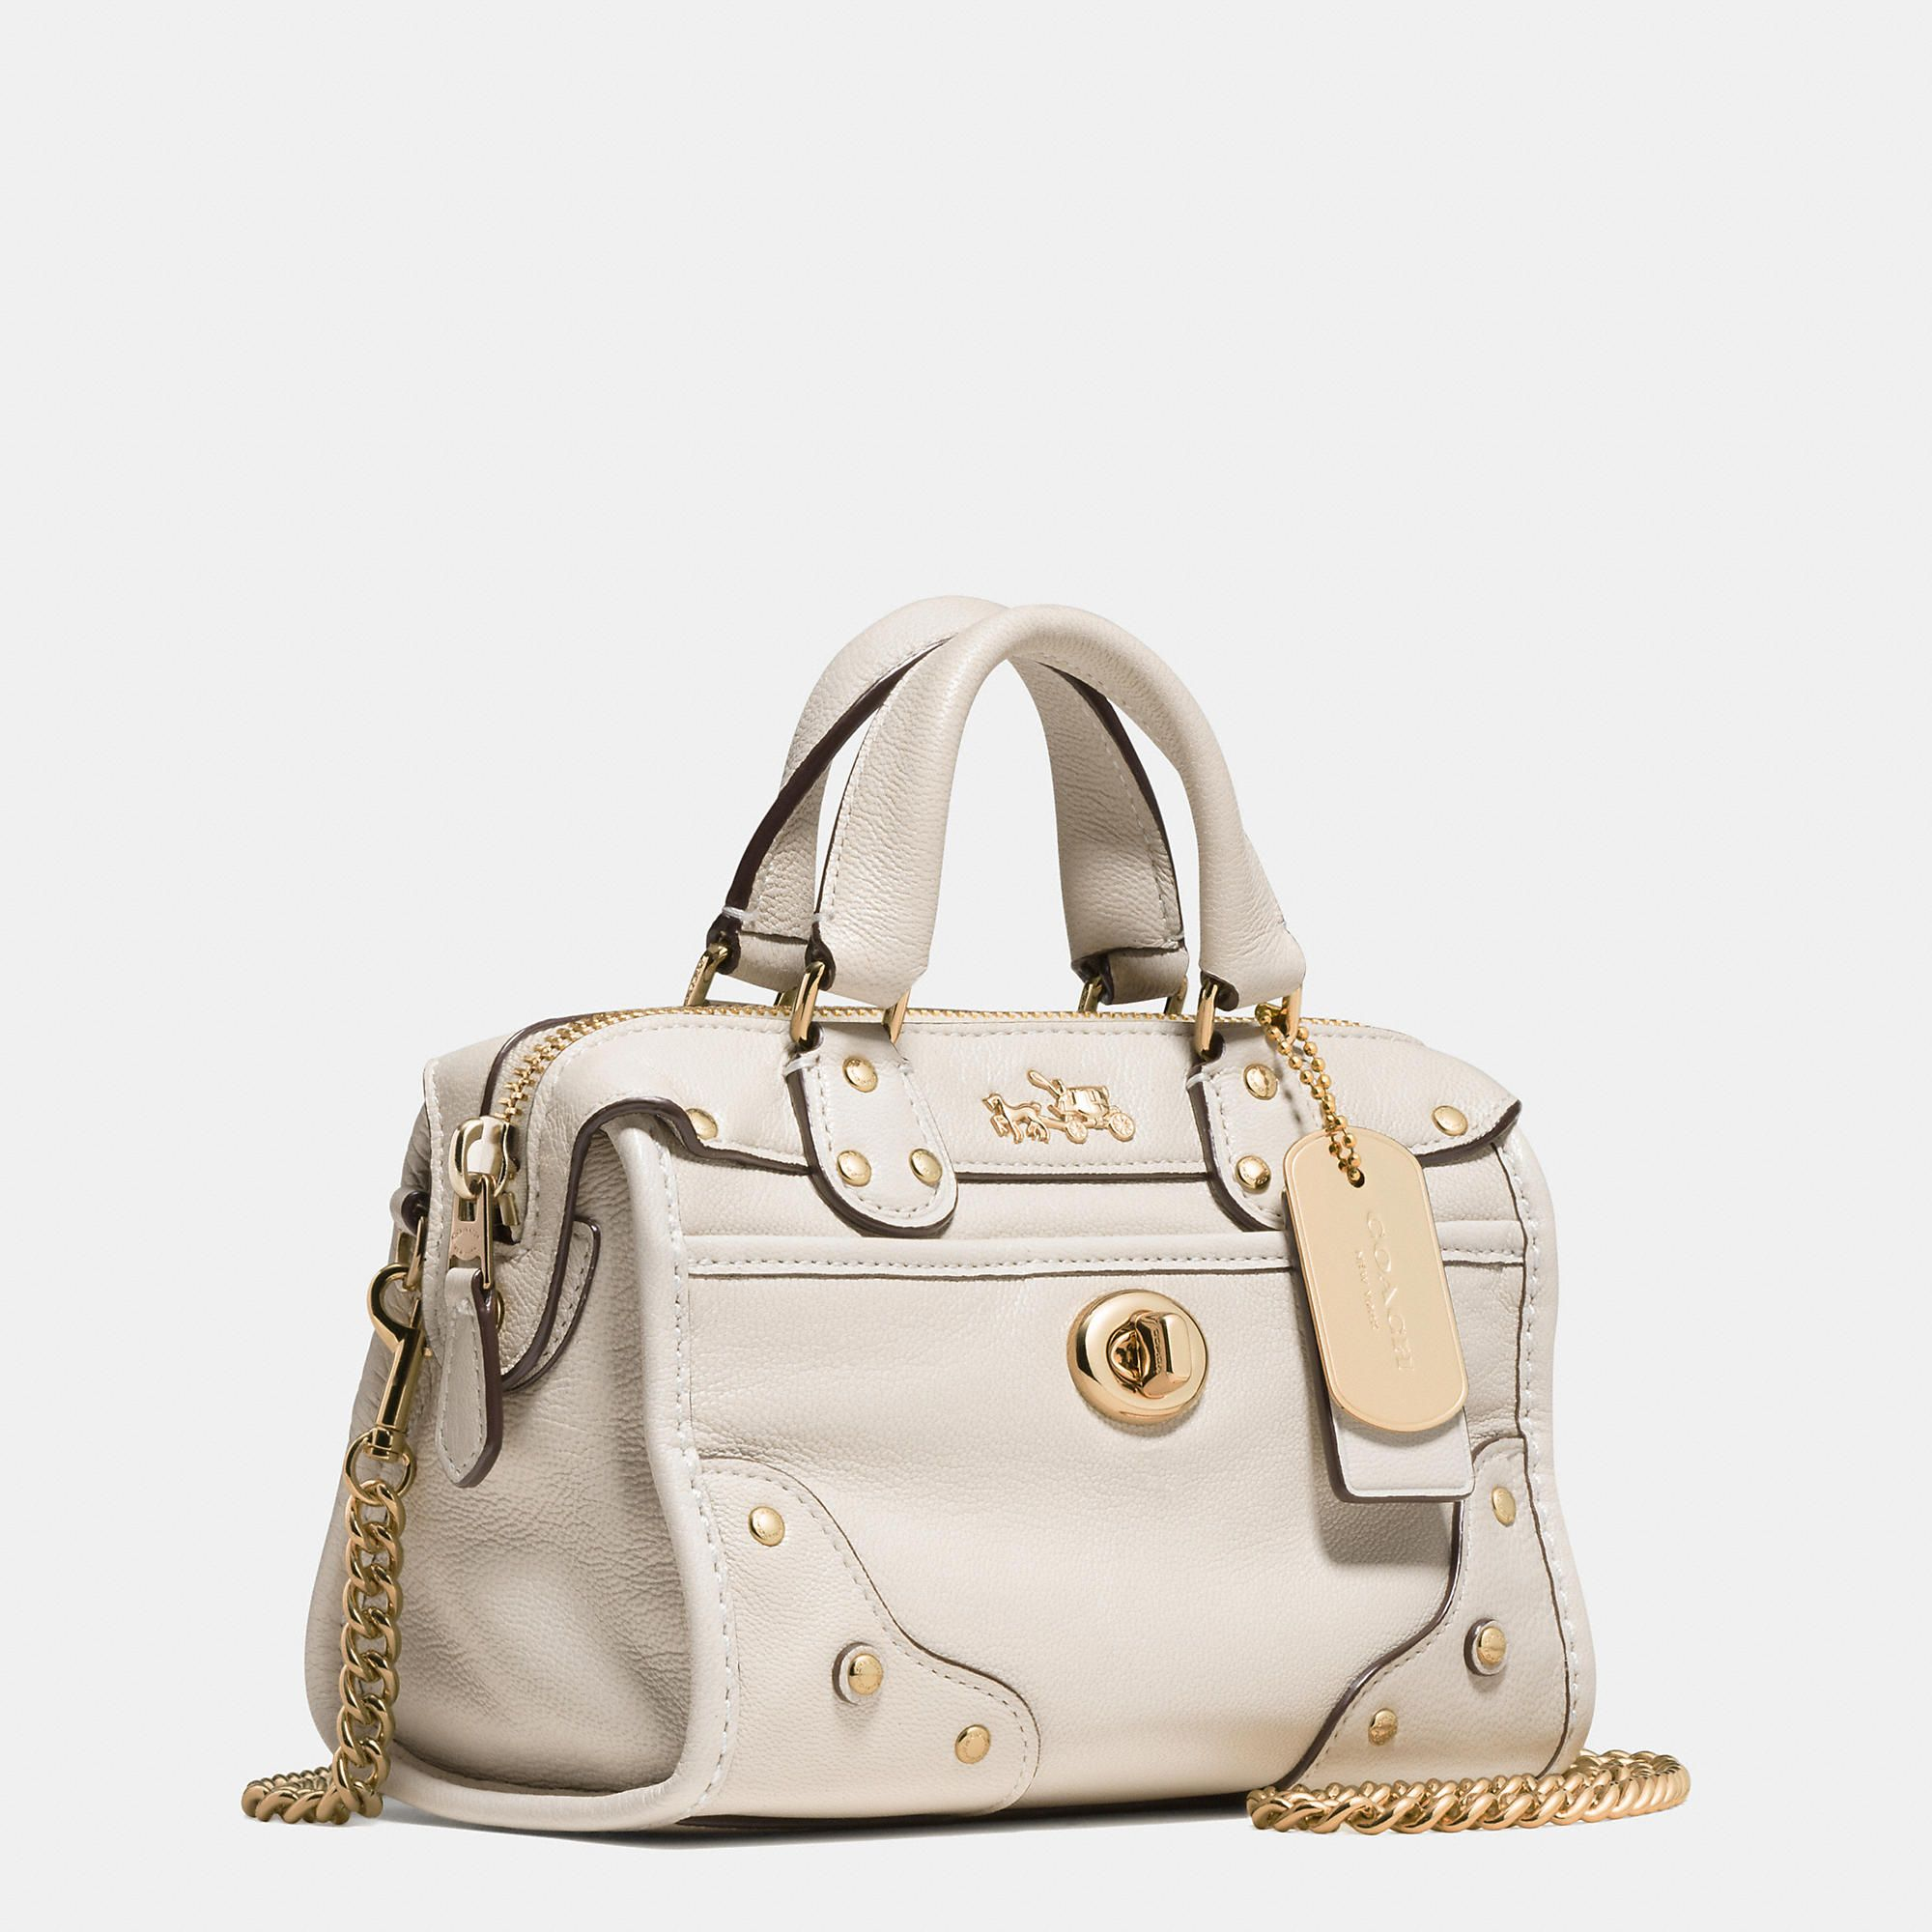 7c3eebb7326f ... best teeny tiny coach designer handbag rhyder satchel 18 in soft grain  leather f6c66 dba13